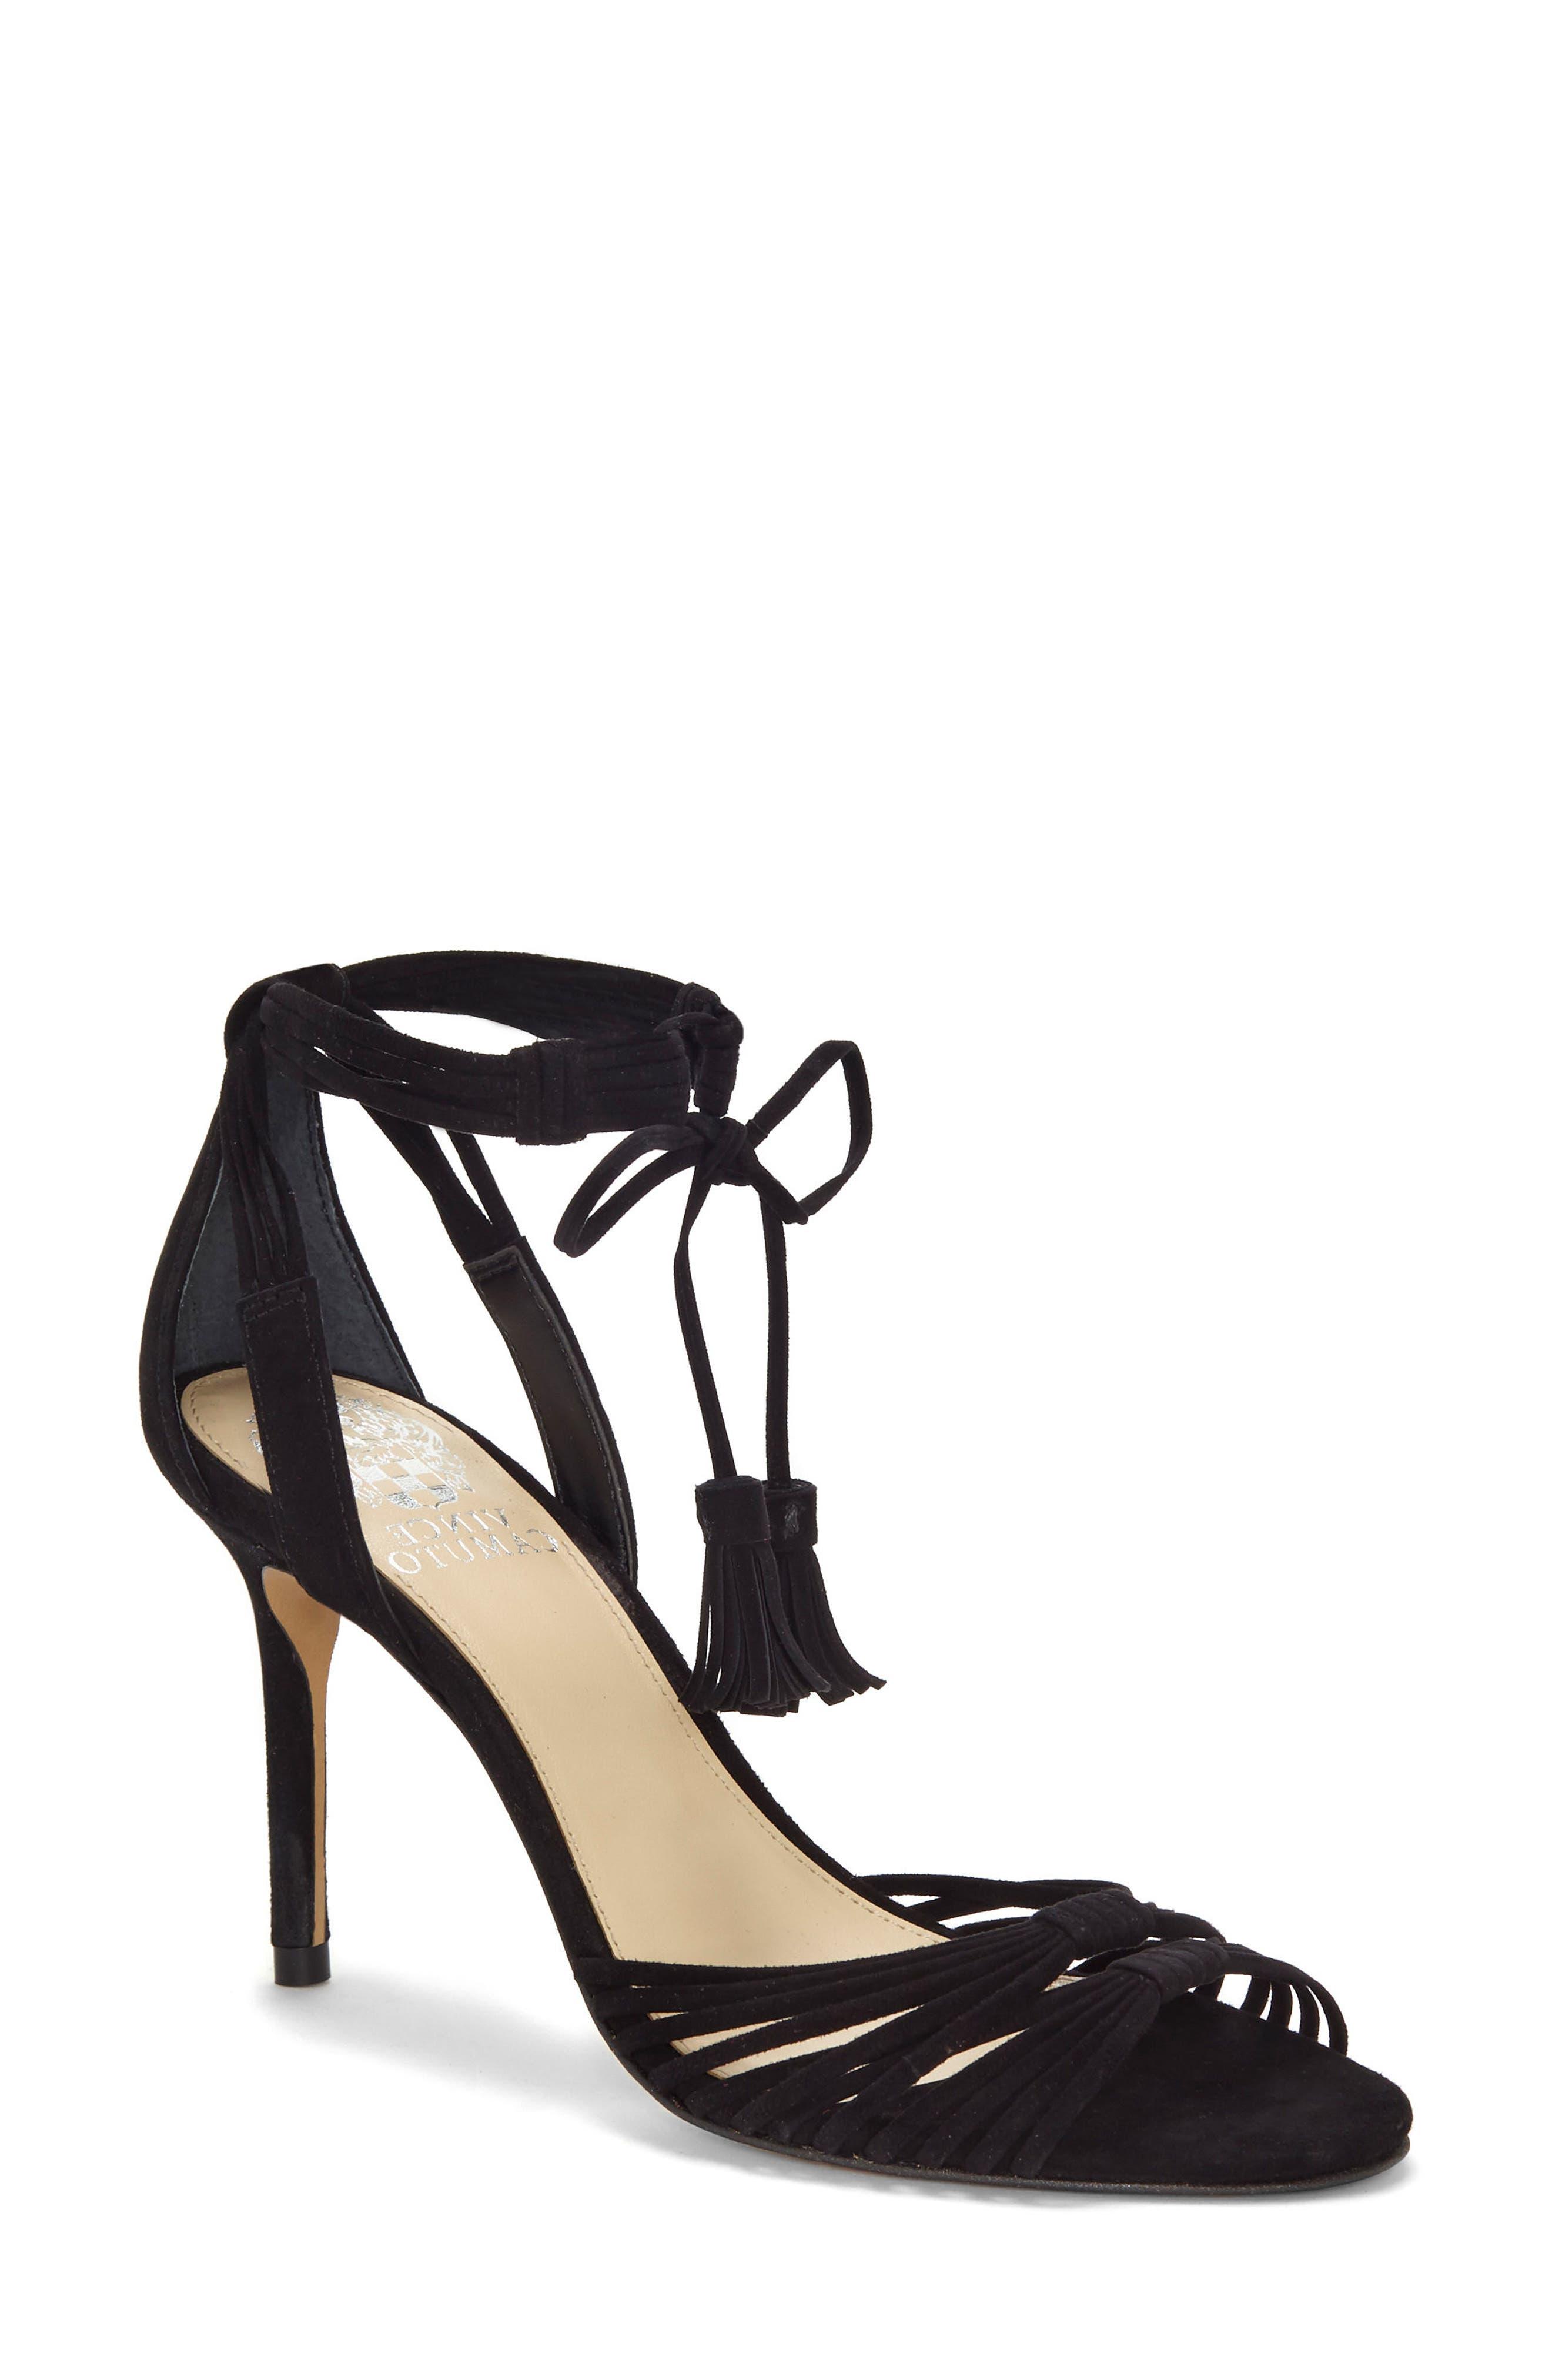 Main Image - Vince Camuto Stellima Tassel Sandal (Women)